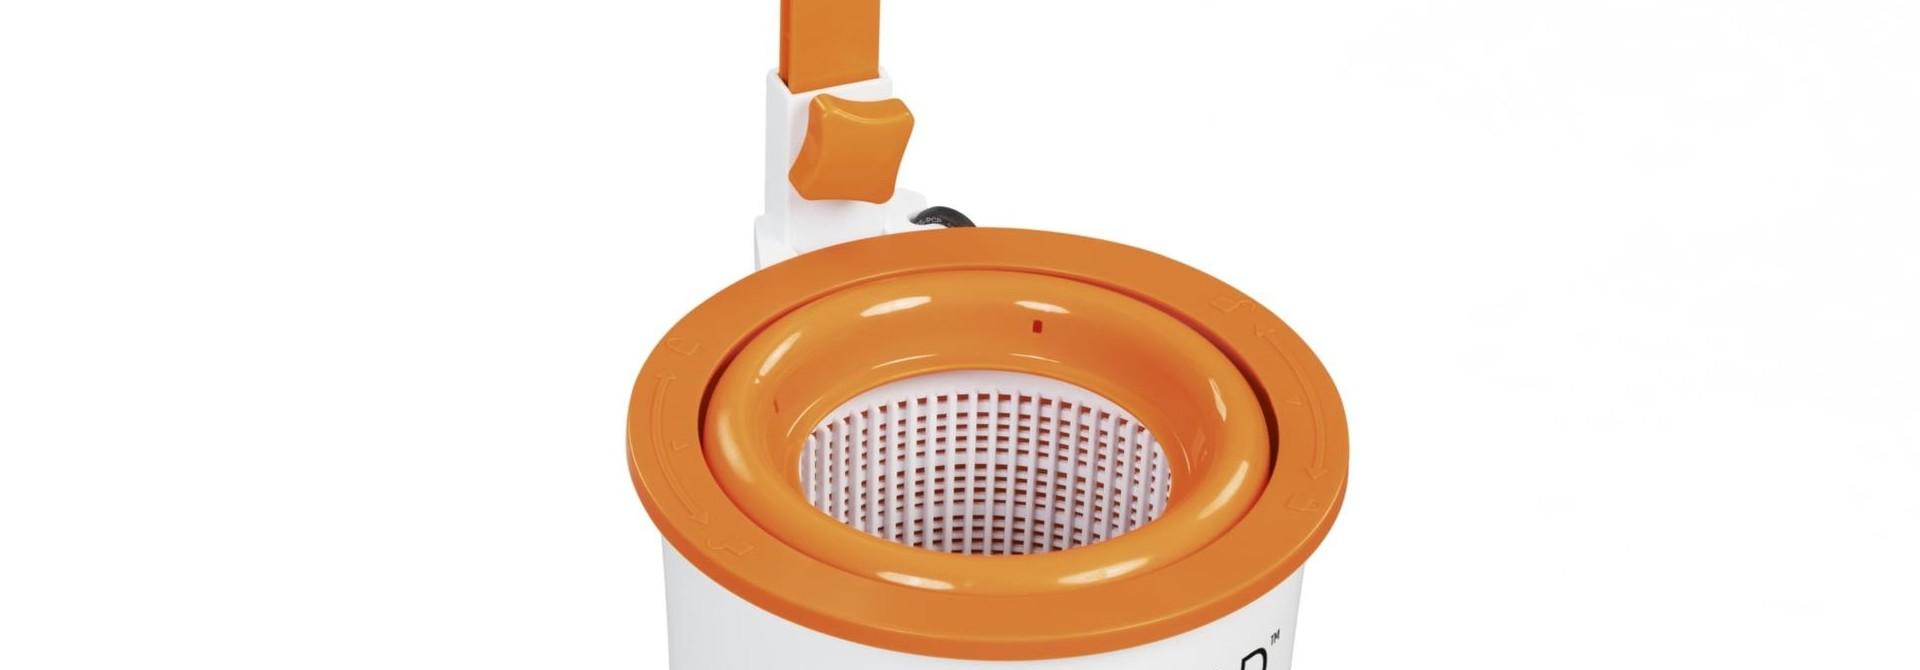 Bestway/Flowclear skimatic filter pump